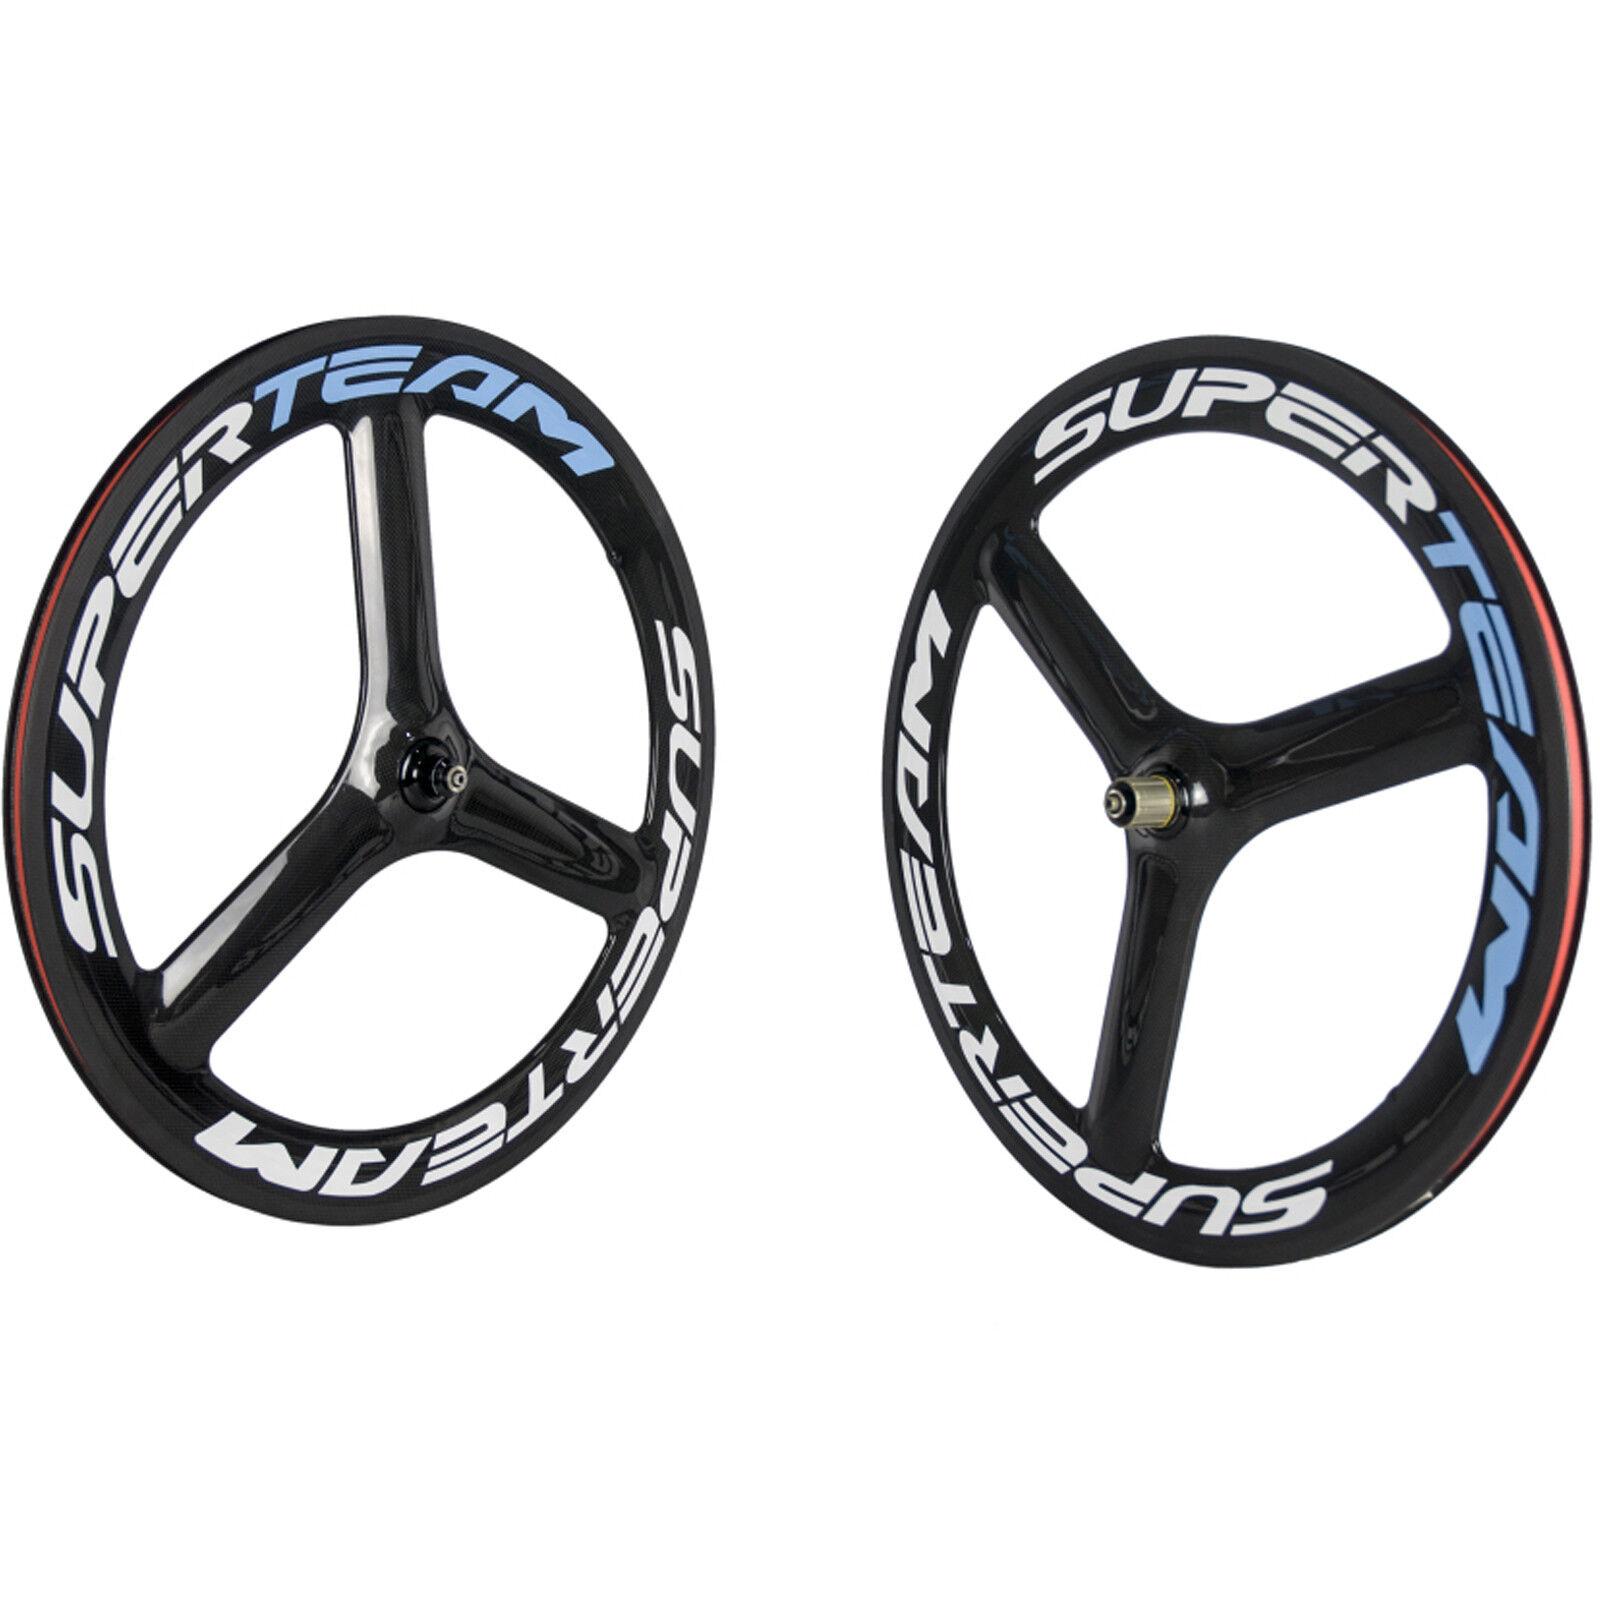 SUPERTEAM 3 Spoke Road Wheels Clincher  65mm Tri Spoke Wheel Carbon Bike Wheelset  no.1 online